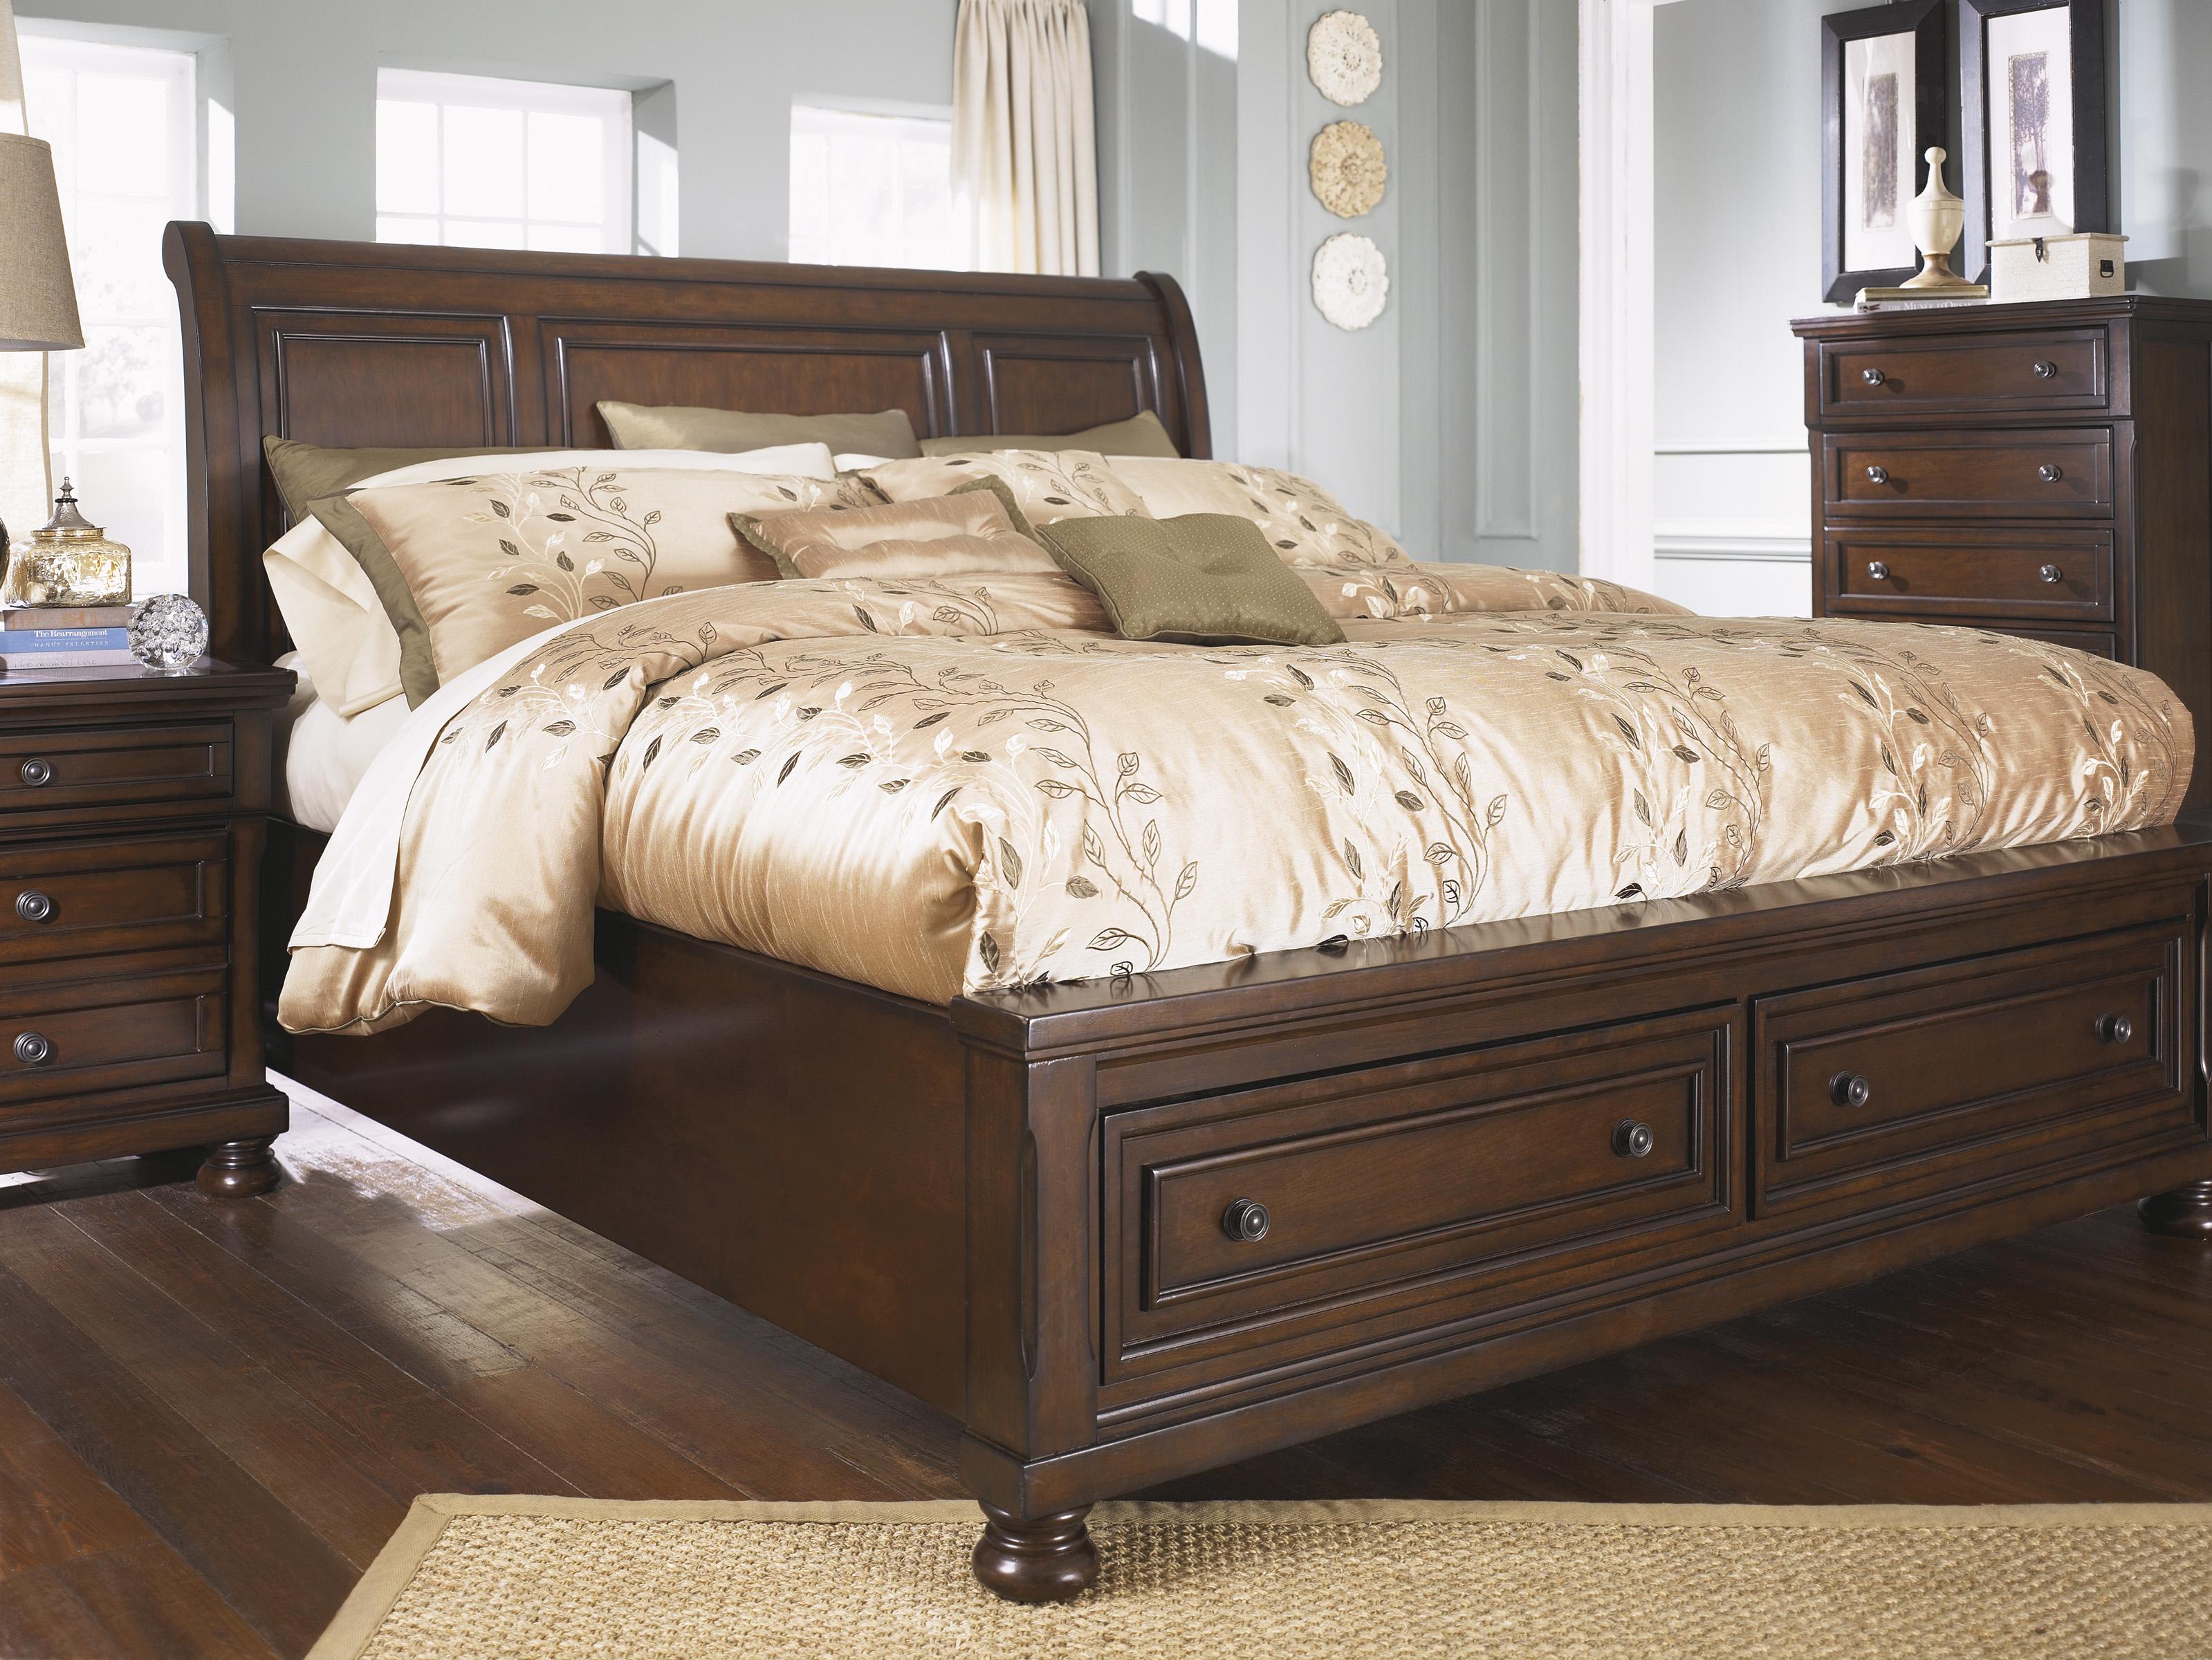 Porter 4 Piece Bedroom Set Marjen Of Chicago Chicago Discount Furniture